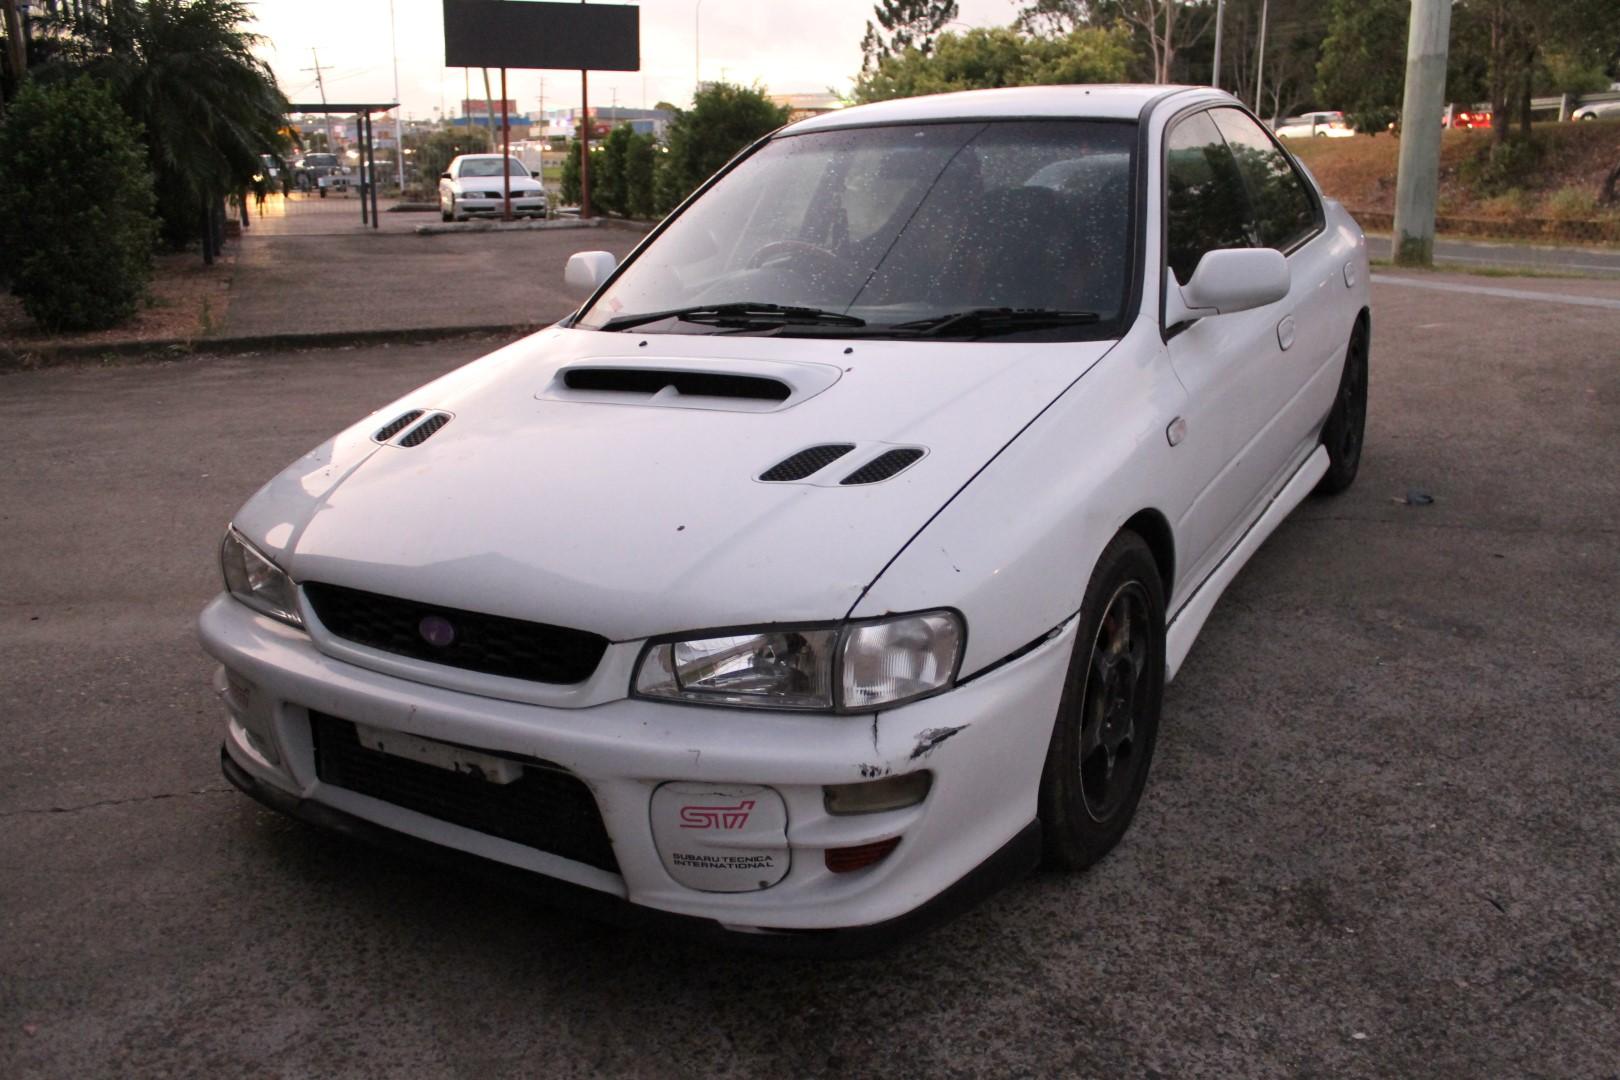 67 99WRX 1999 Subaru Impreza WRX GC8